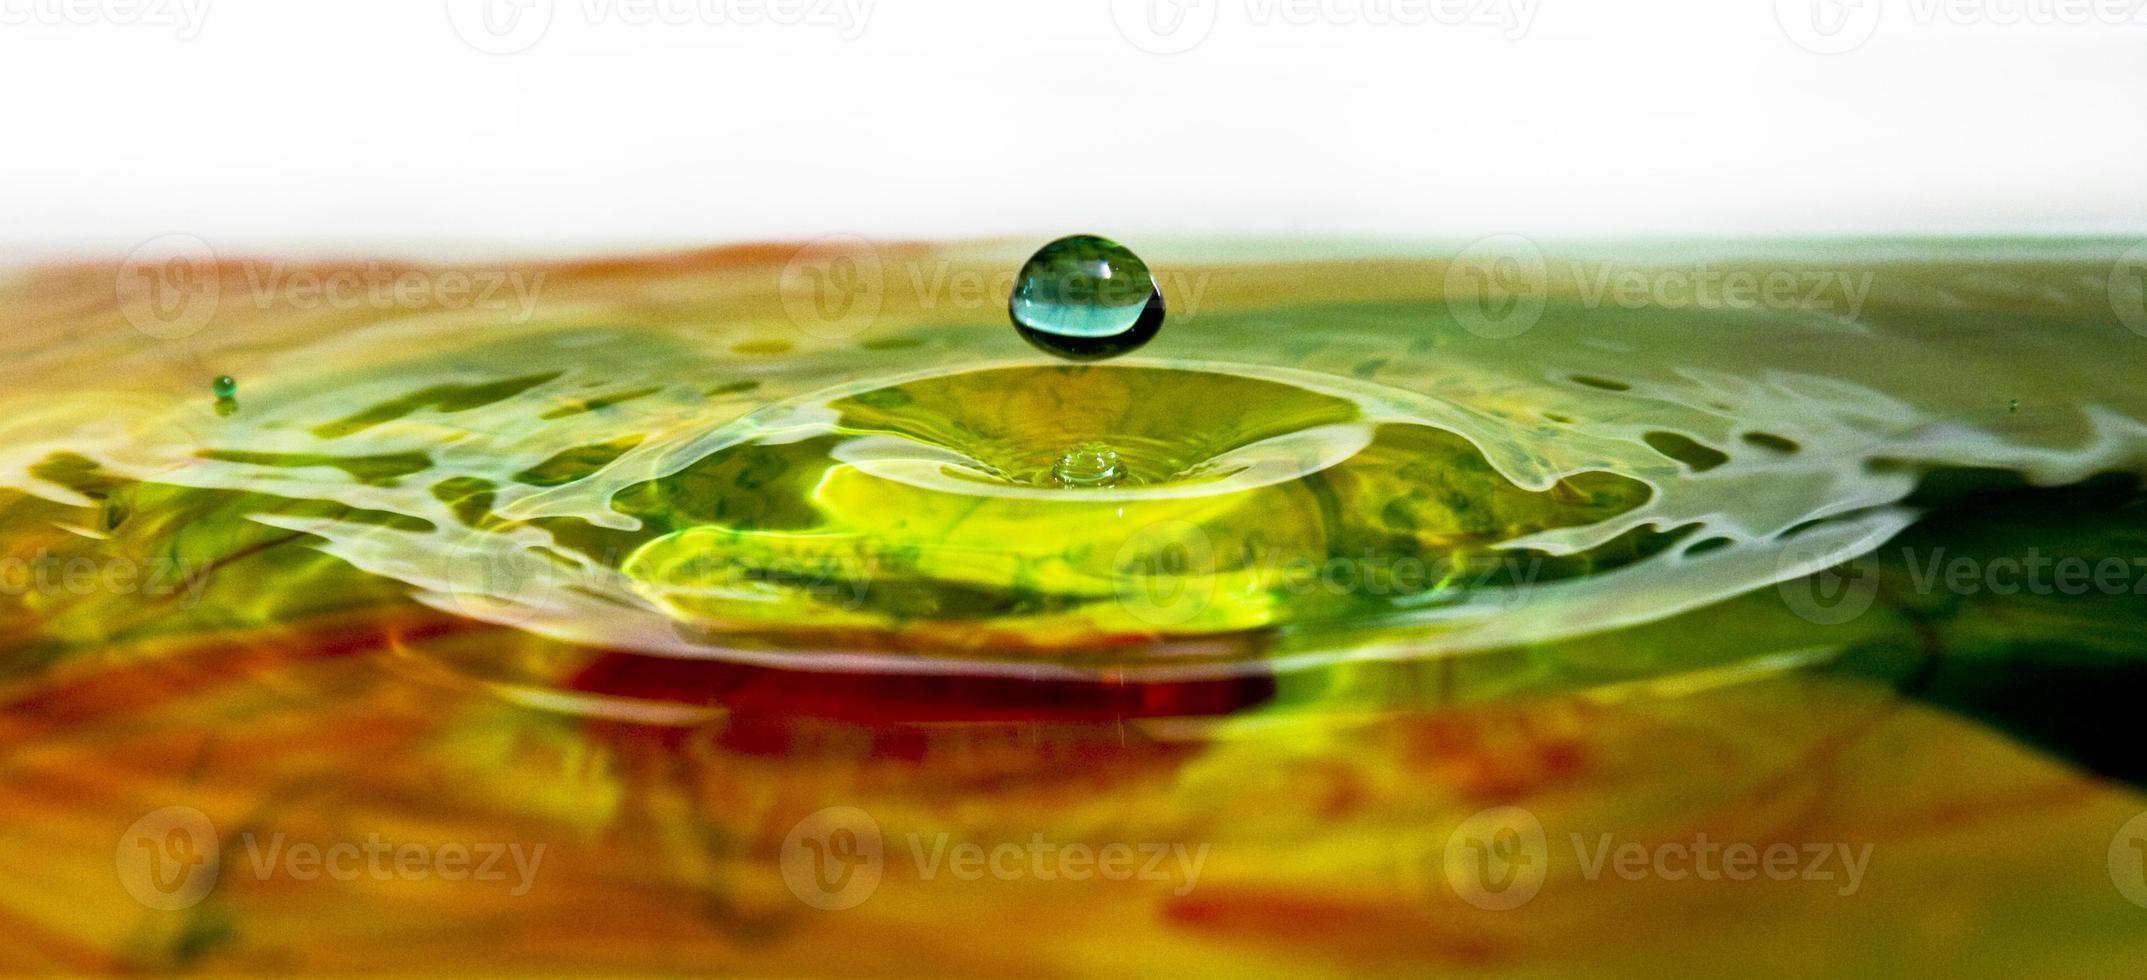 waterdruppel regenboog rimpel foto